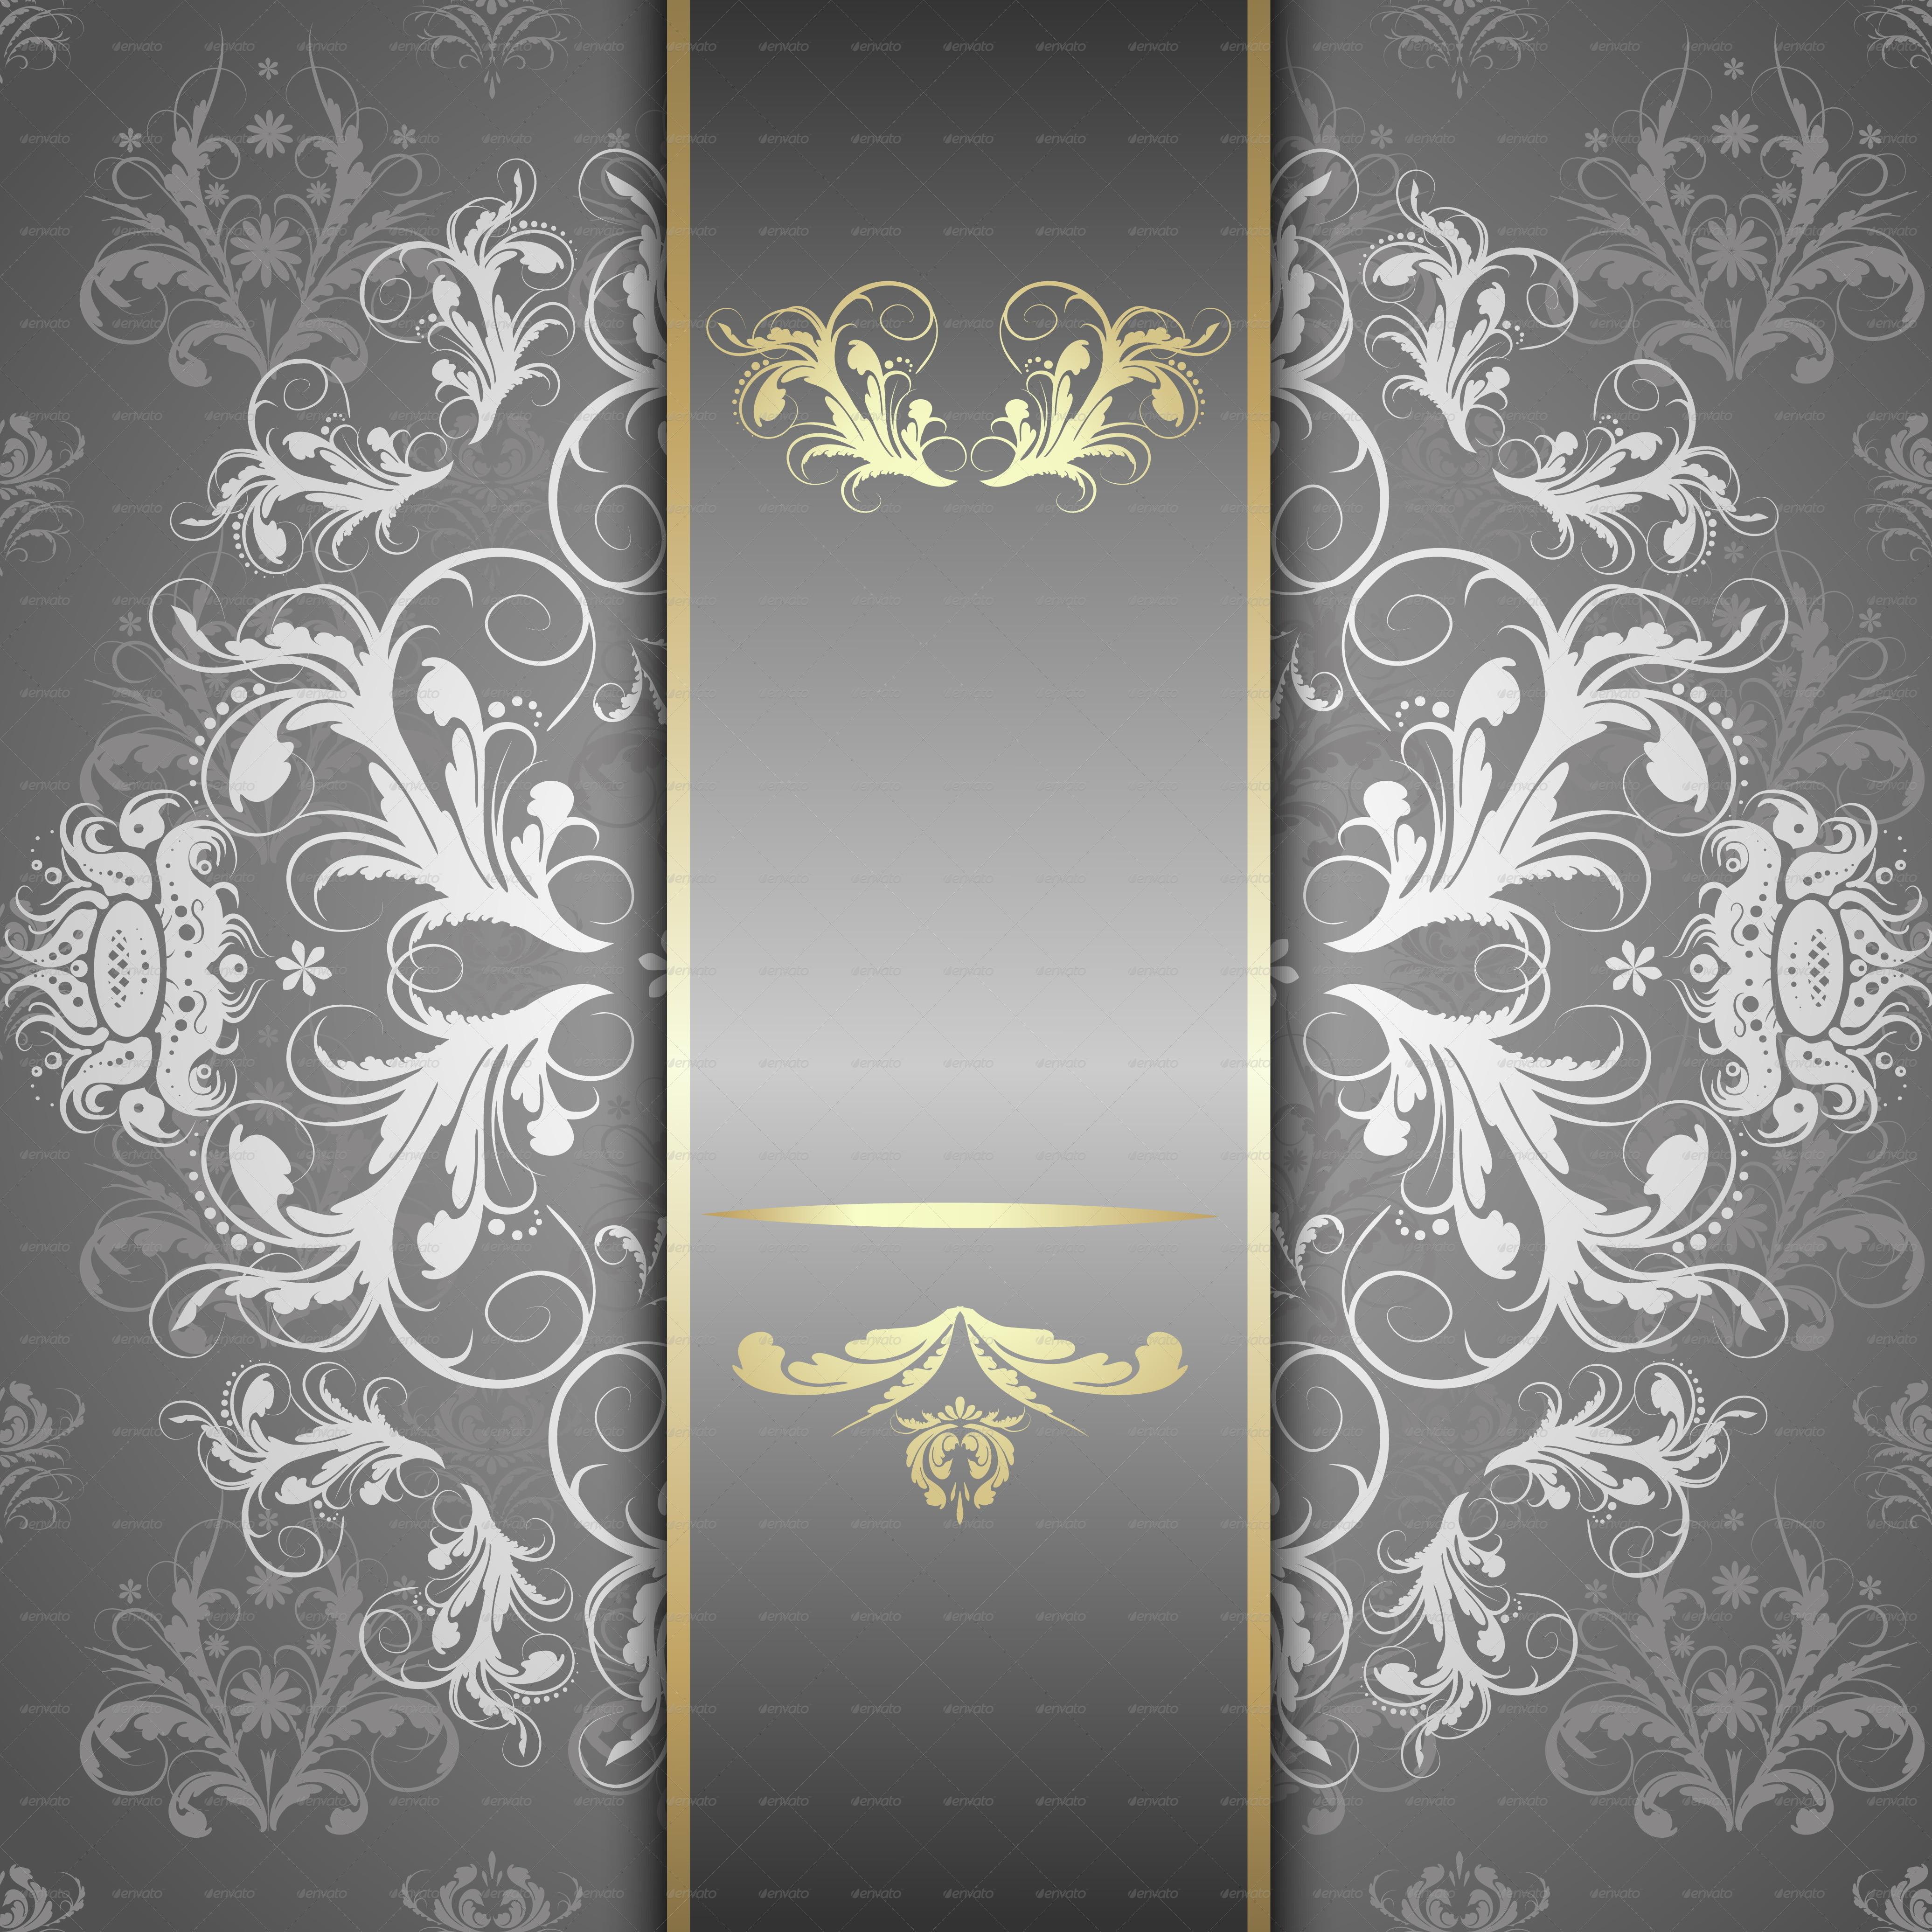 Silver pattern background themestack